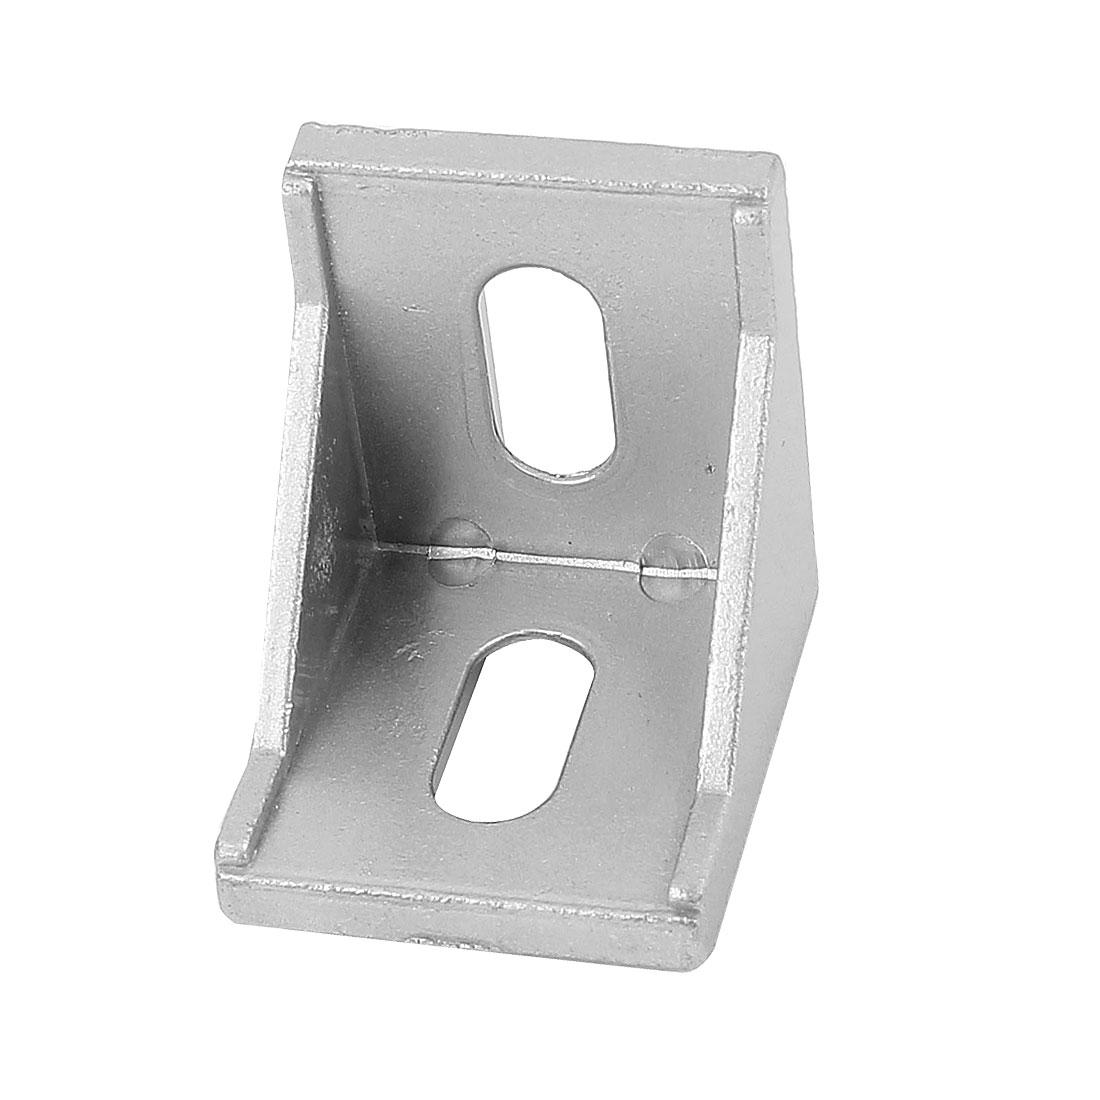 Aluminum Alloy Corner Brace Angle Bracket Support 40x40x35mm Silver Tone